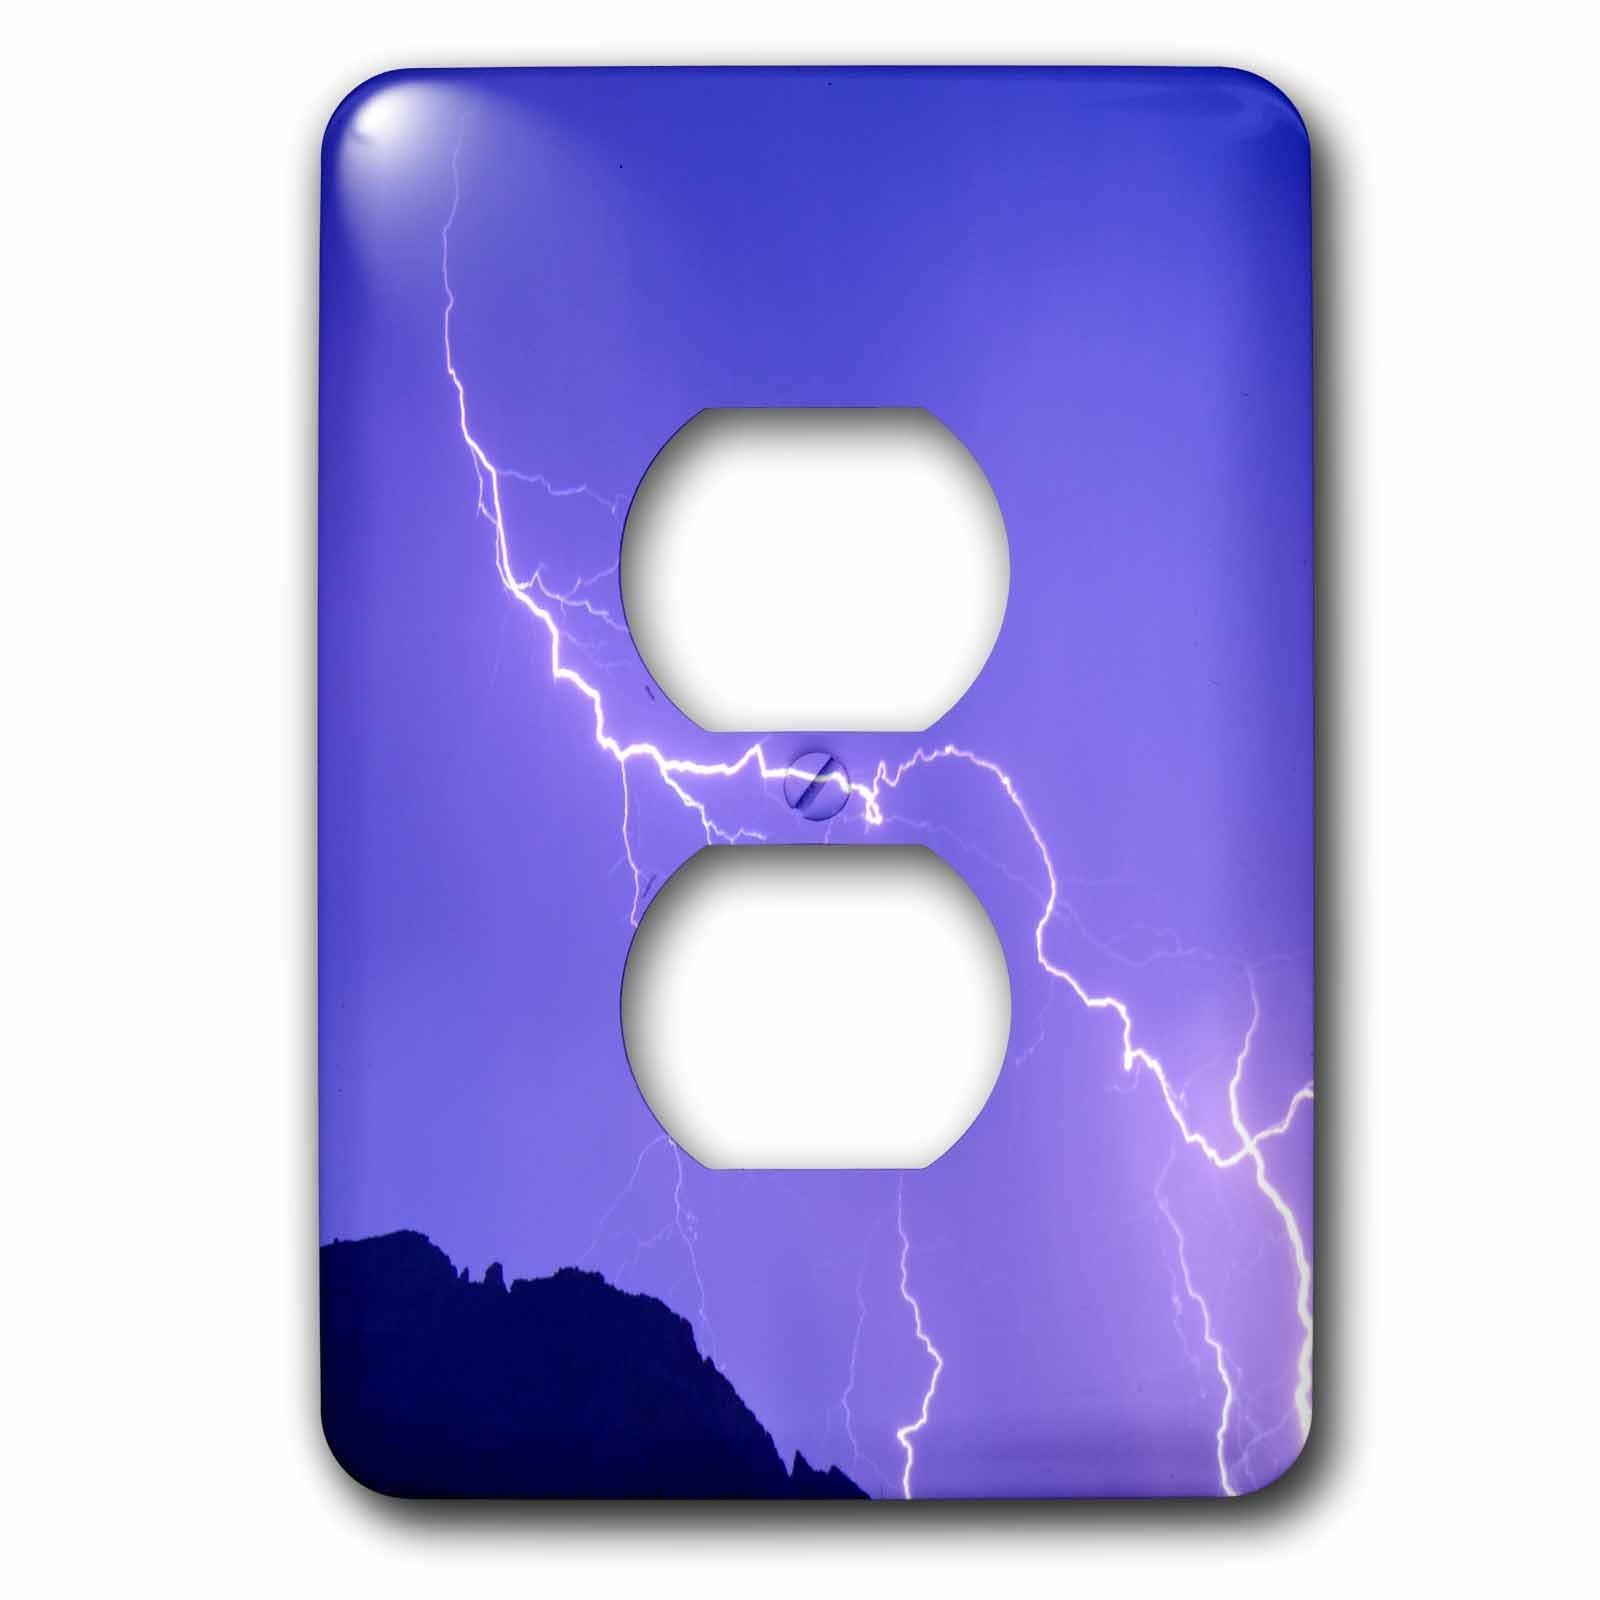 3dRose LSP_278454_6 USA, Arizona. Sedona, Lightning Plug Outlet Cover, Mixed